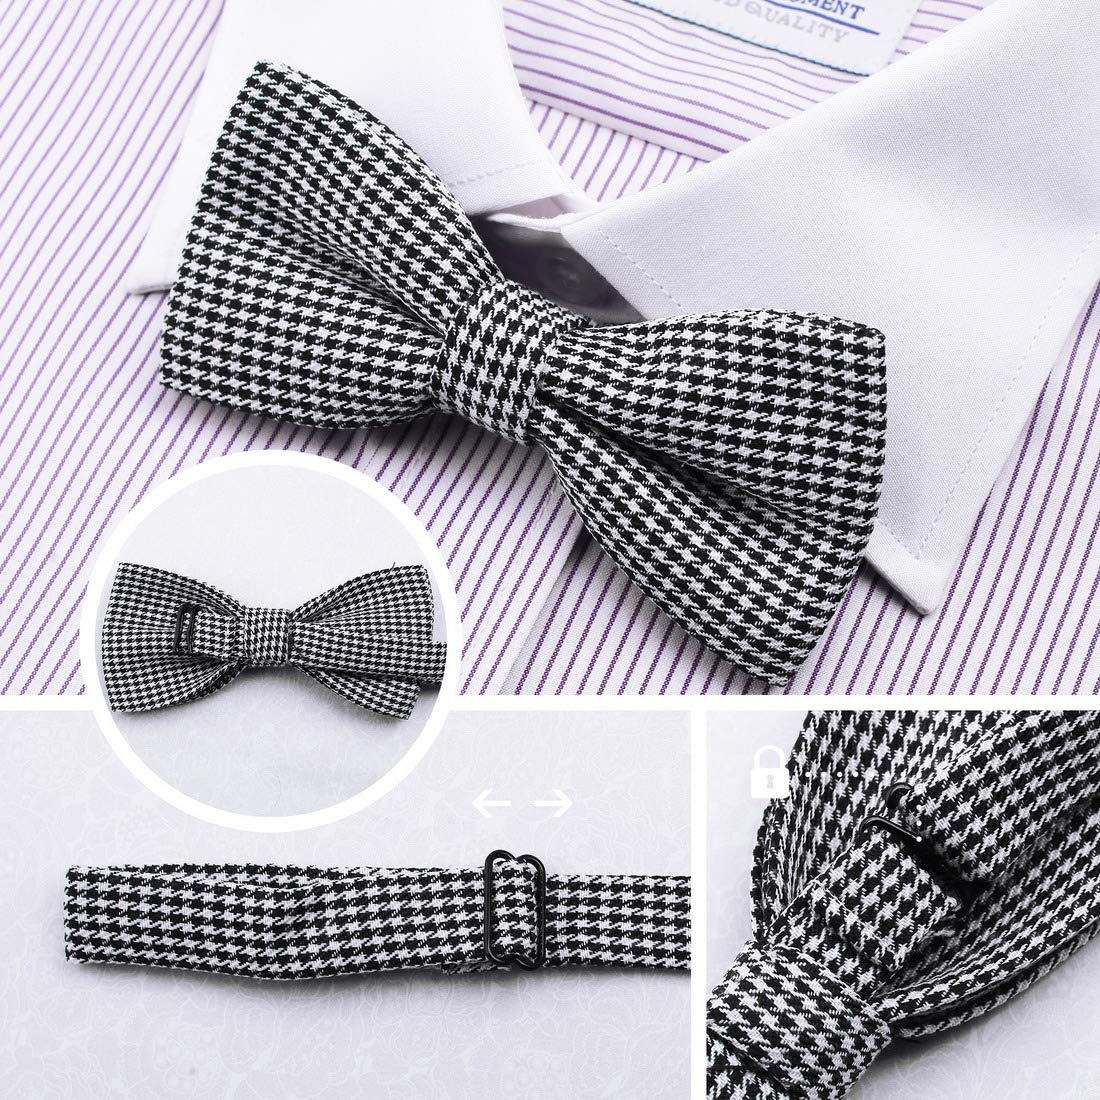 DBE0167 Groomsmen Pre-Tied Microfiber Bow ties Popular For Teen 3 Pack Bow Tie Set By Dan Smith by Dan Smith (Image #1)